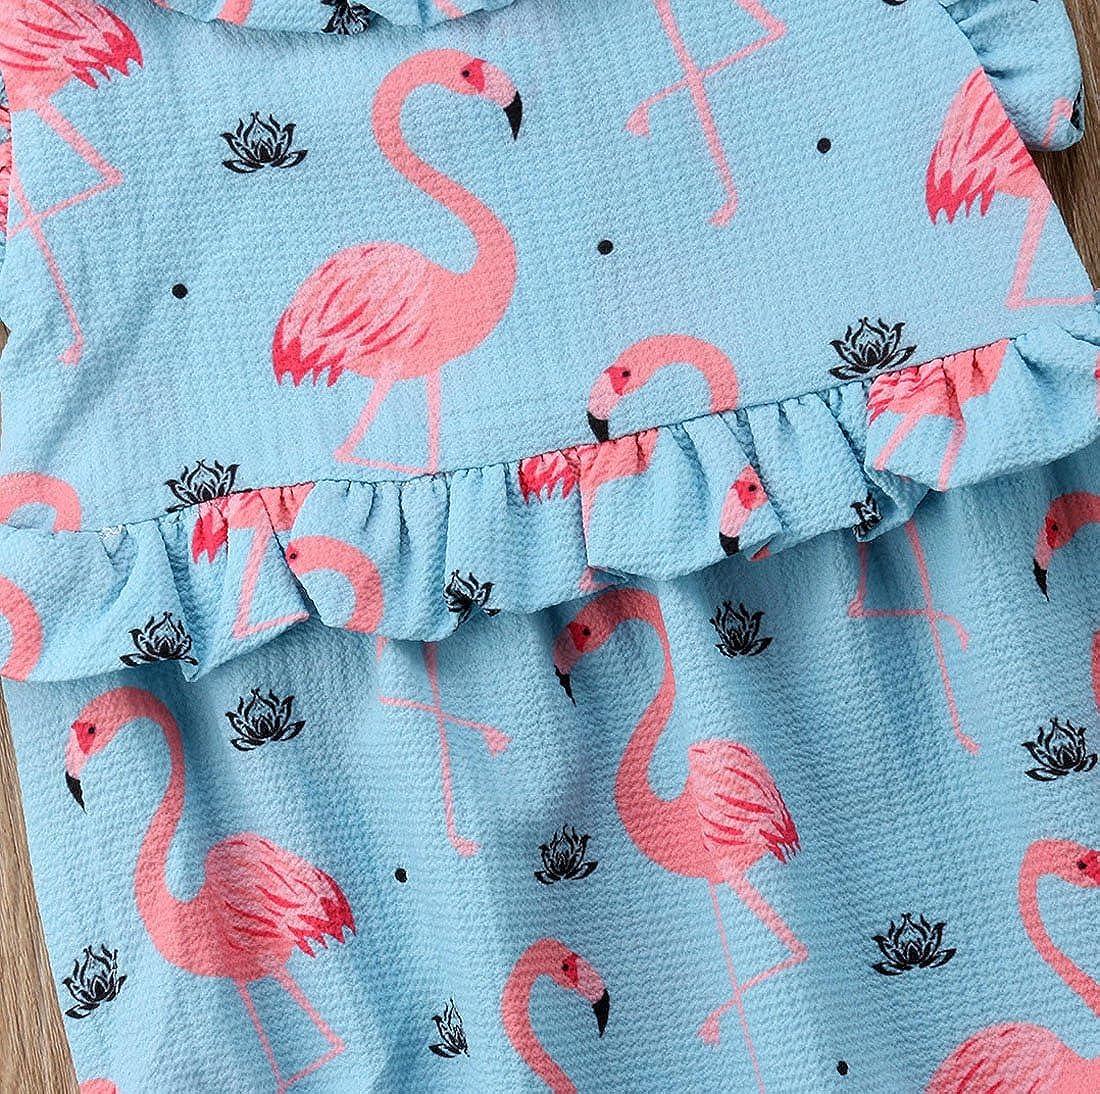 Imcute Newborn Baby Girls Flamingo Ruffle Romper Bodysuit Outfit